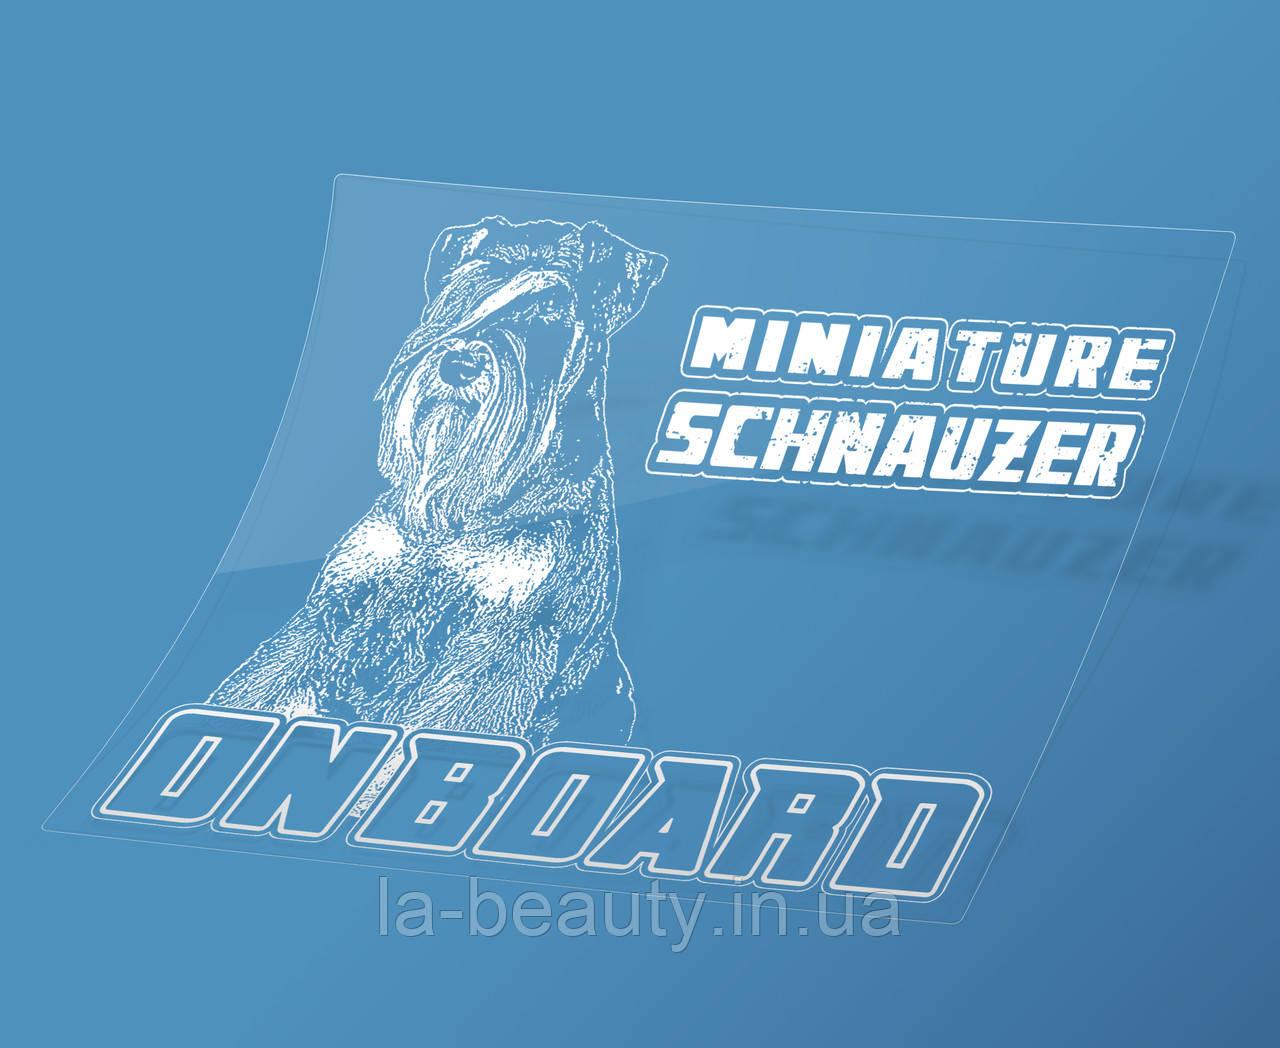 Наклейка на машину/авто Цвергшнауцер на борту (Miniature Schnauzer on Board)